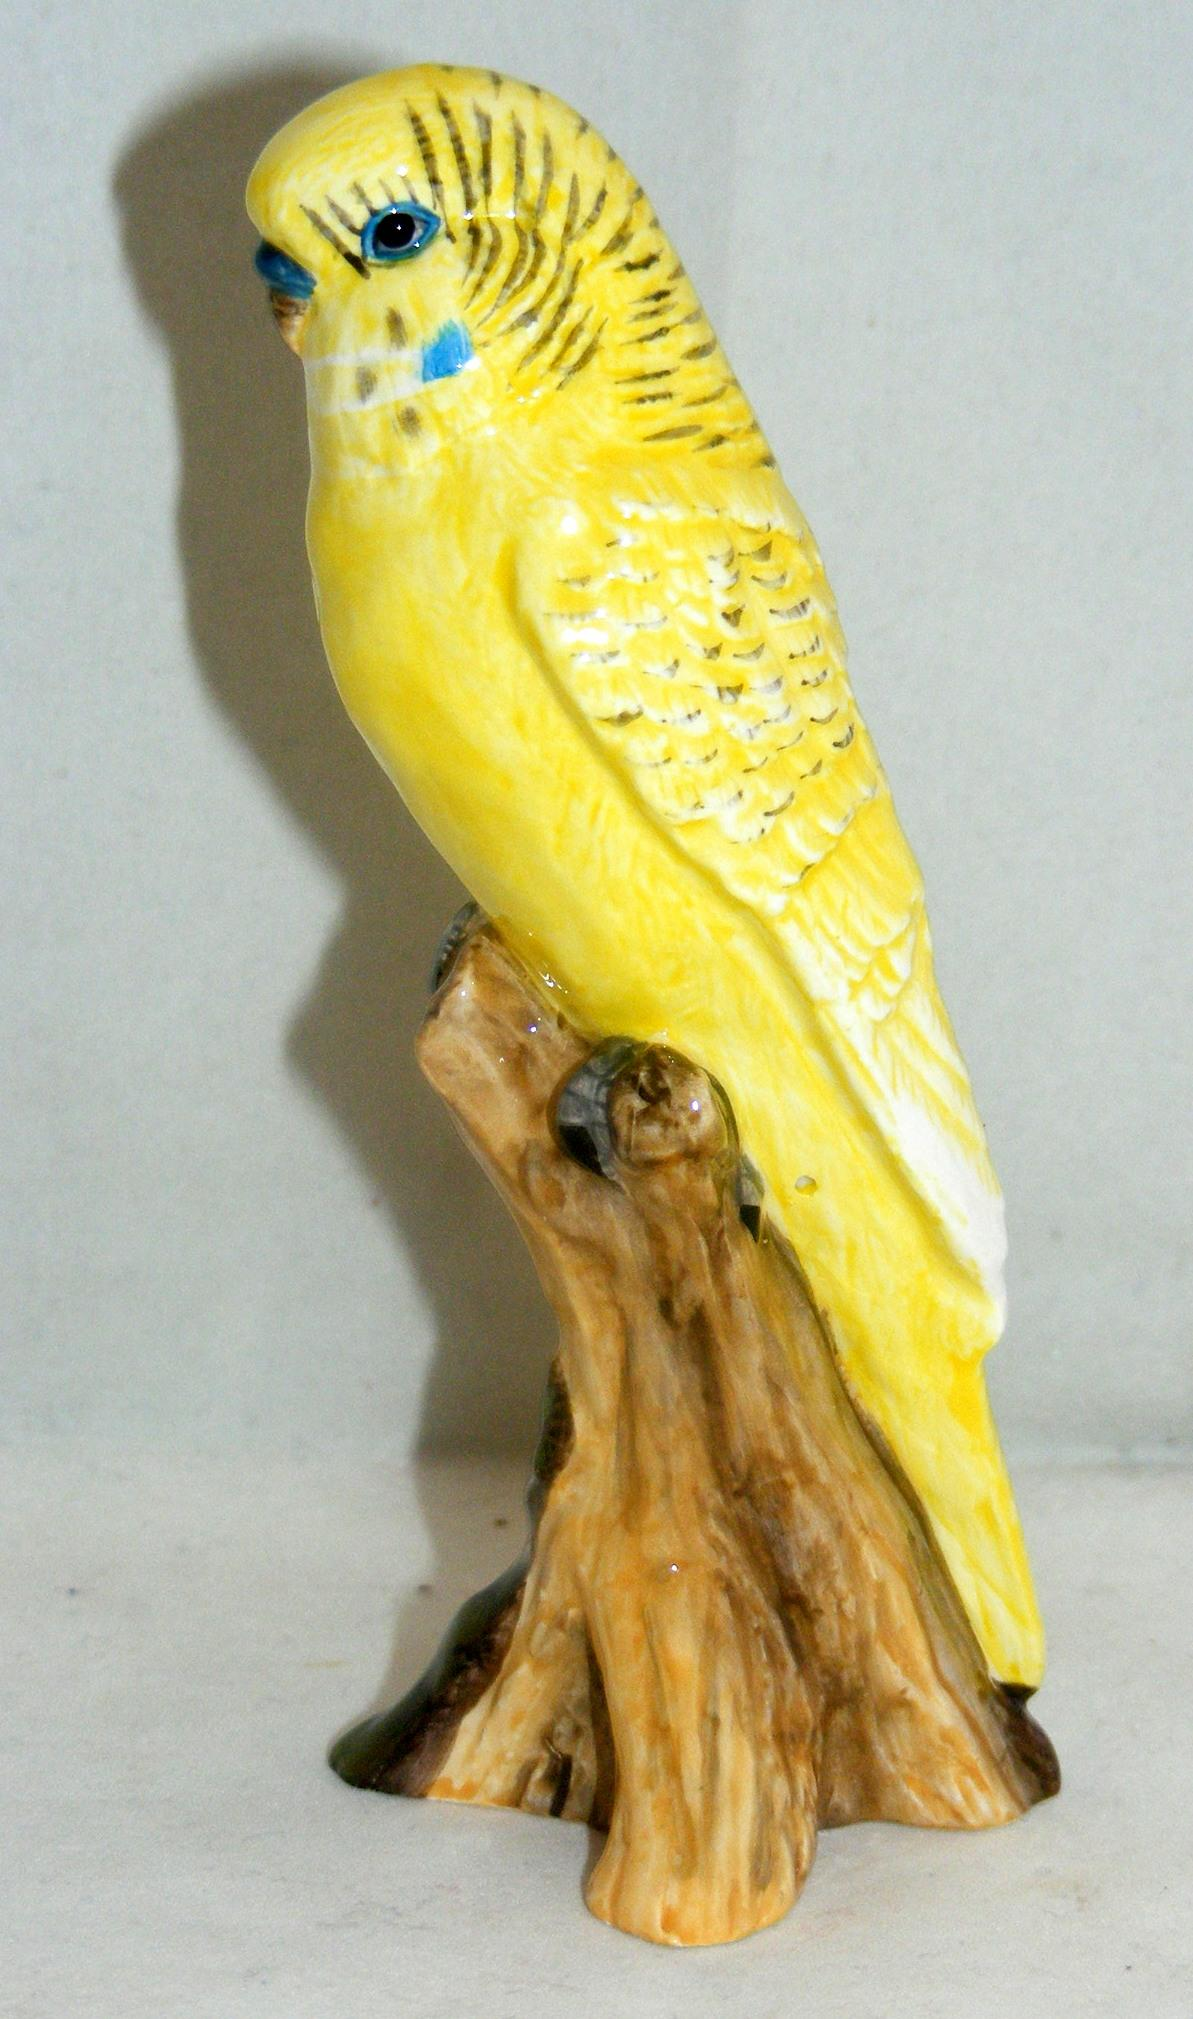 John Beswick Pet Pals Bird Figure Grey Green Yellow